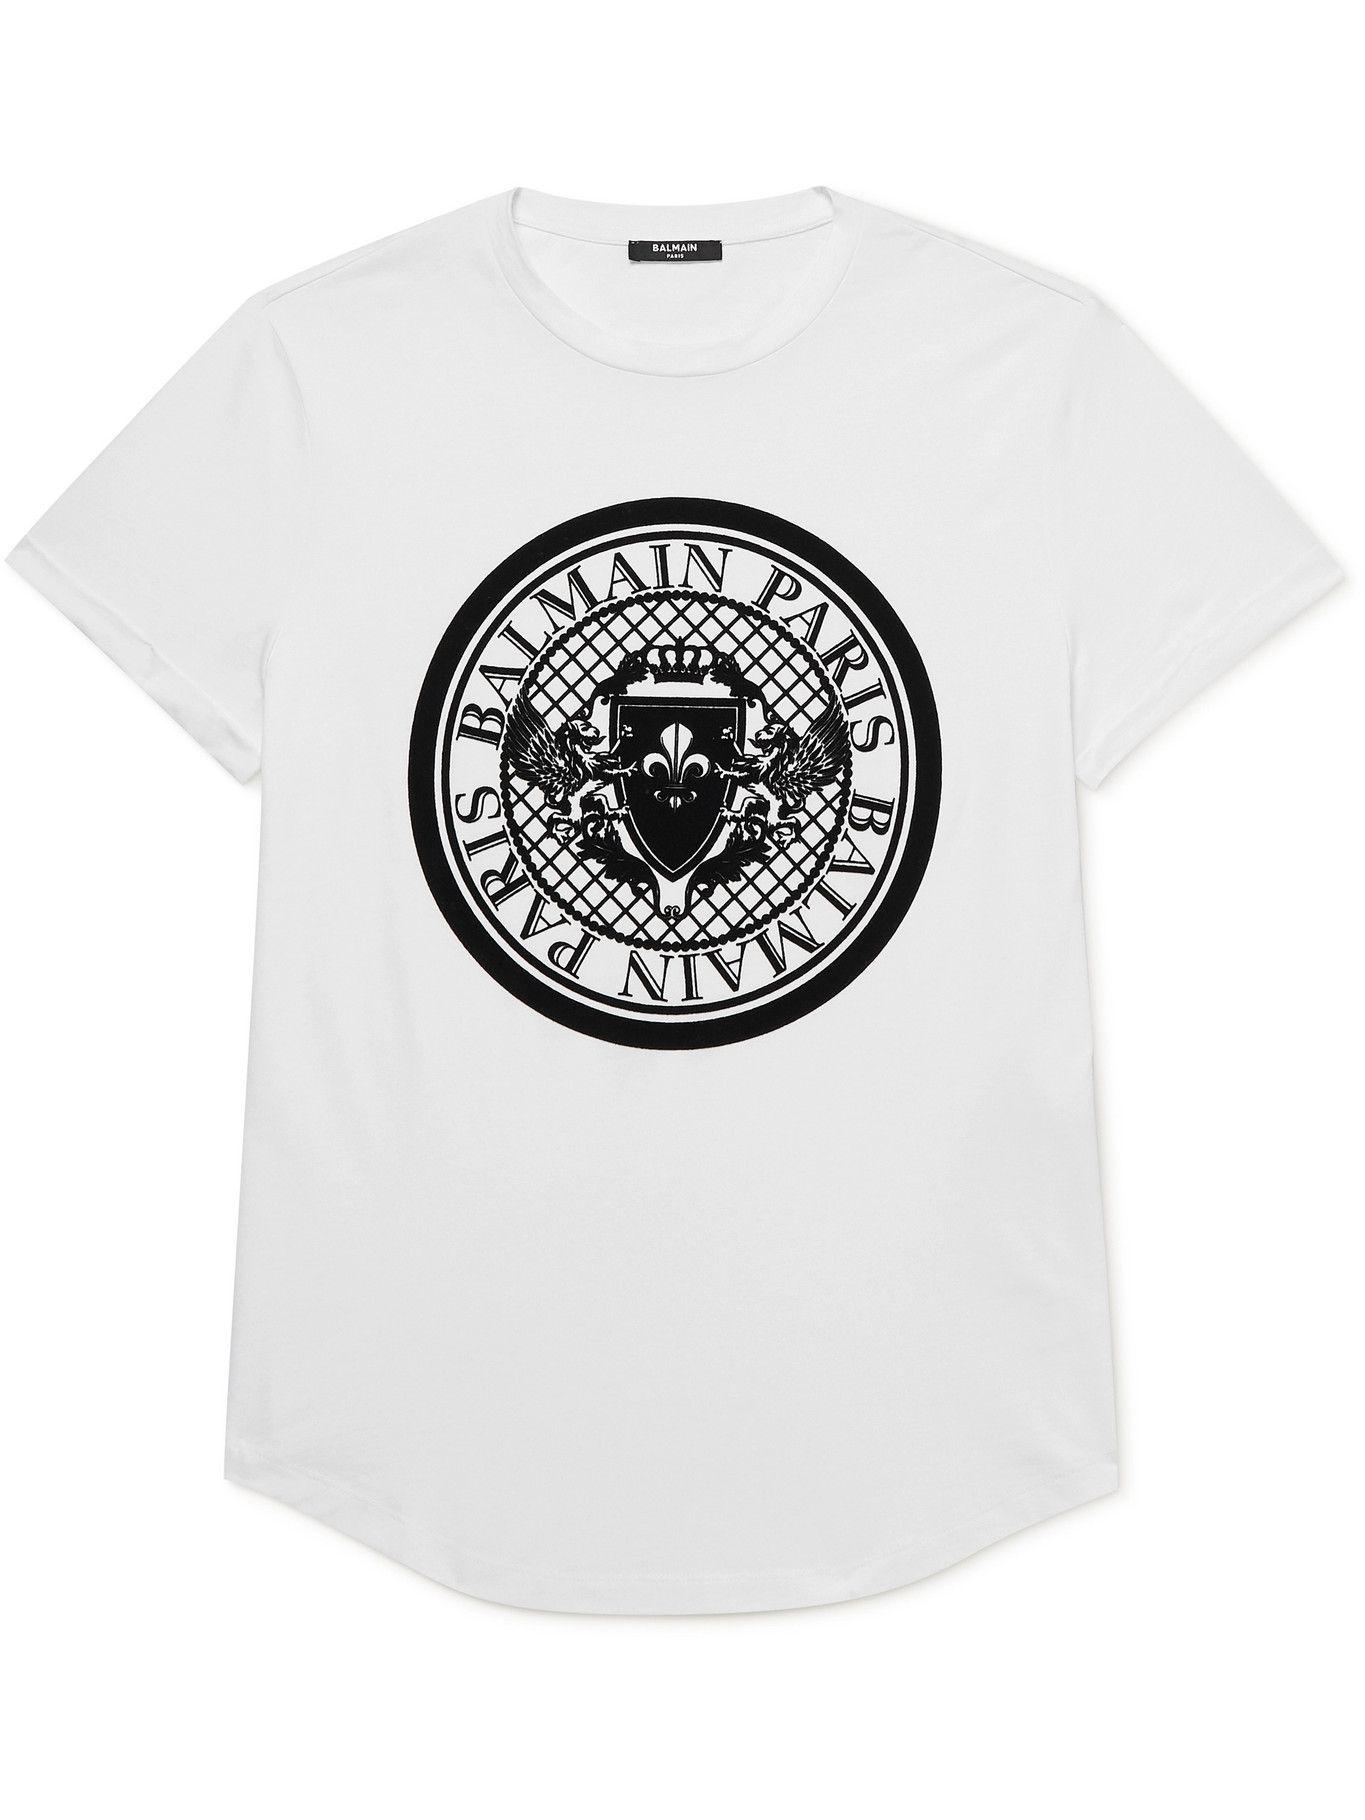 BALMAIN - Logo-Flocked Cotton-Jersey T-Shirt - White